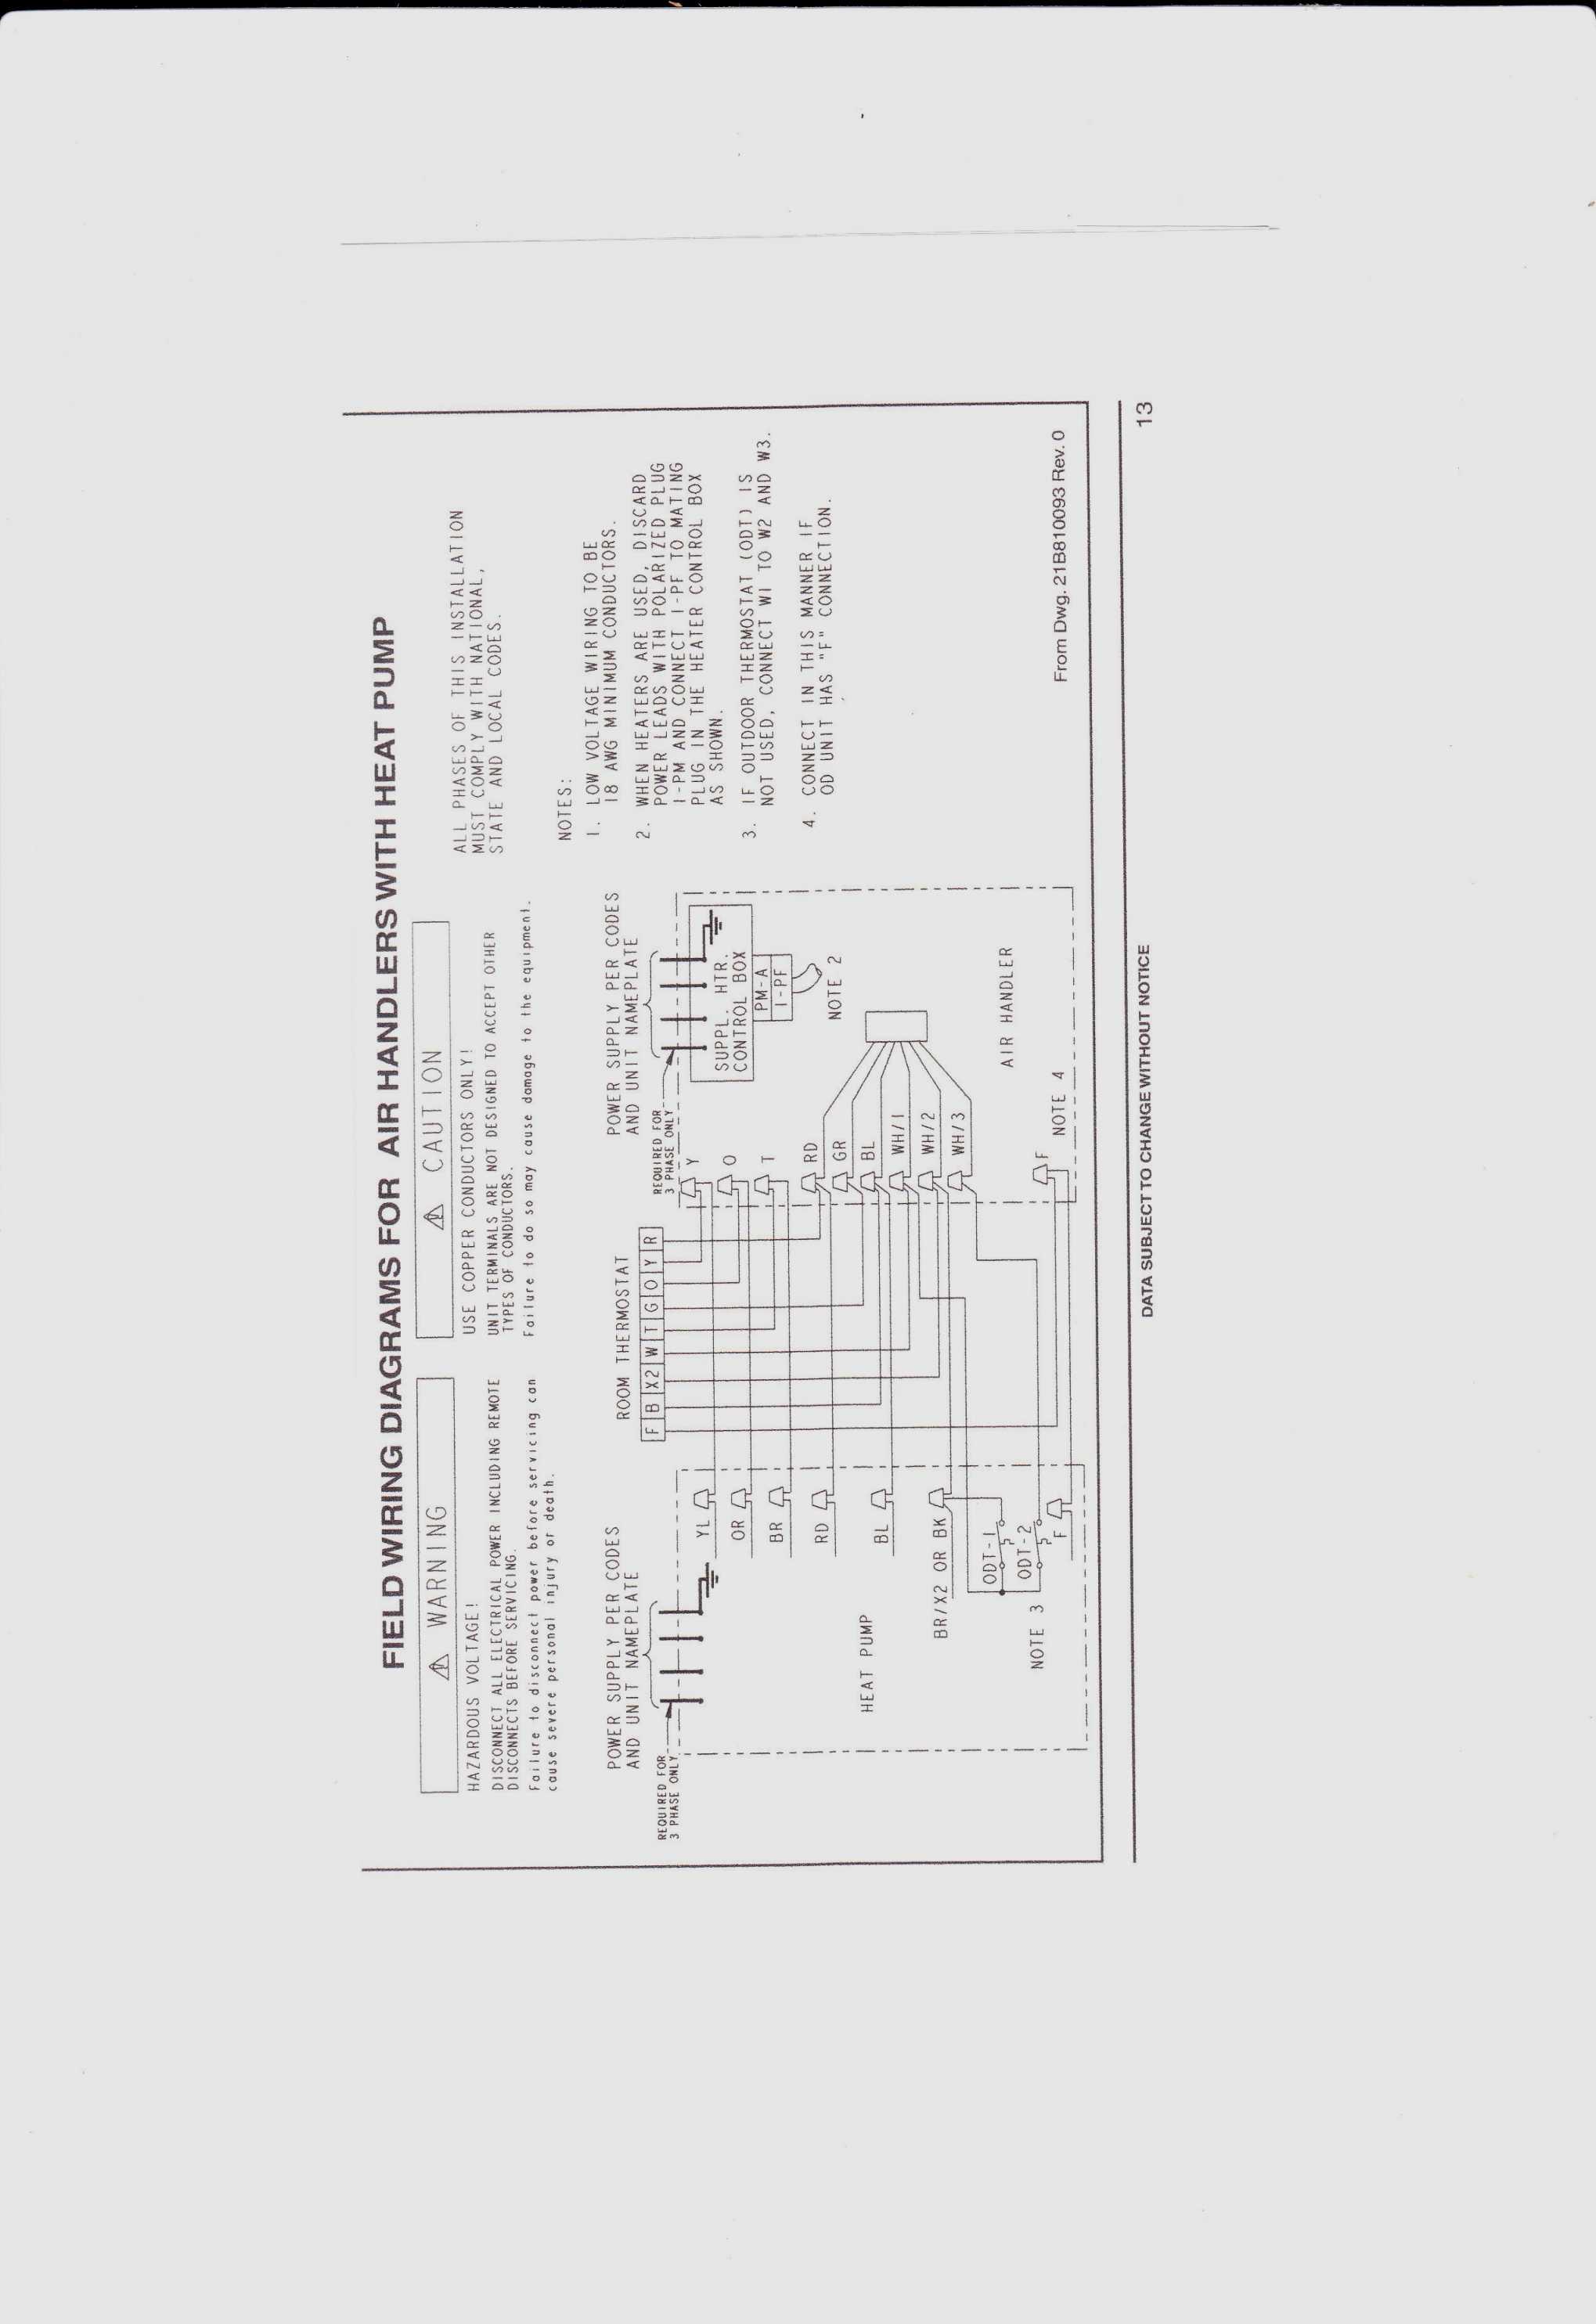 Des Co Phase Converter Wiring Diagram | Wiring Diagram - Rotary Phase Converter Wiring Diagram